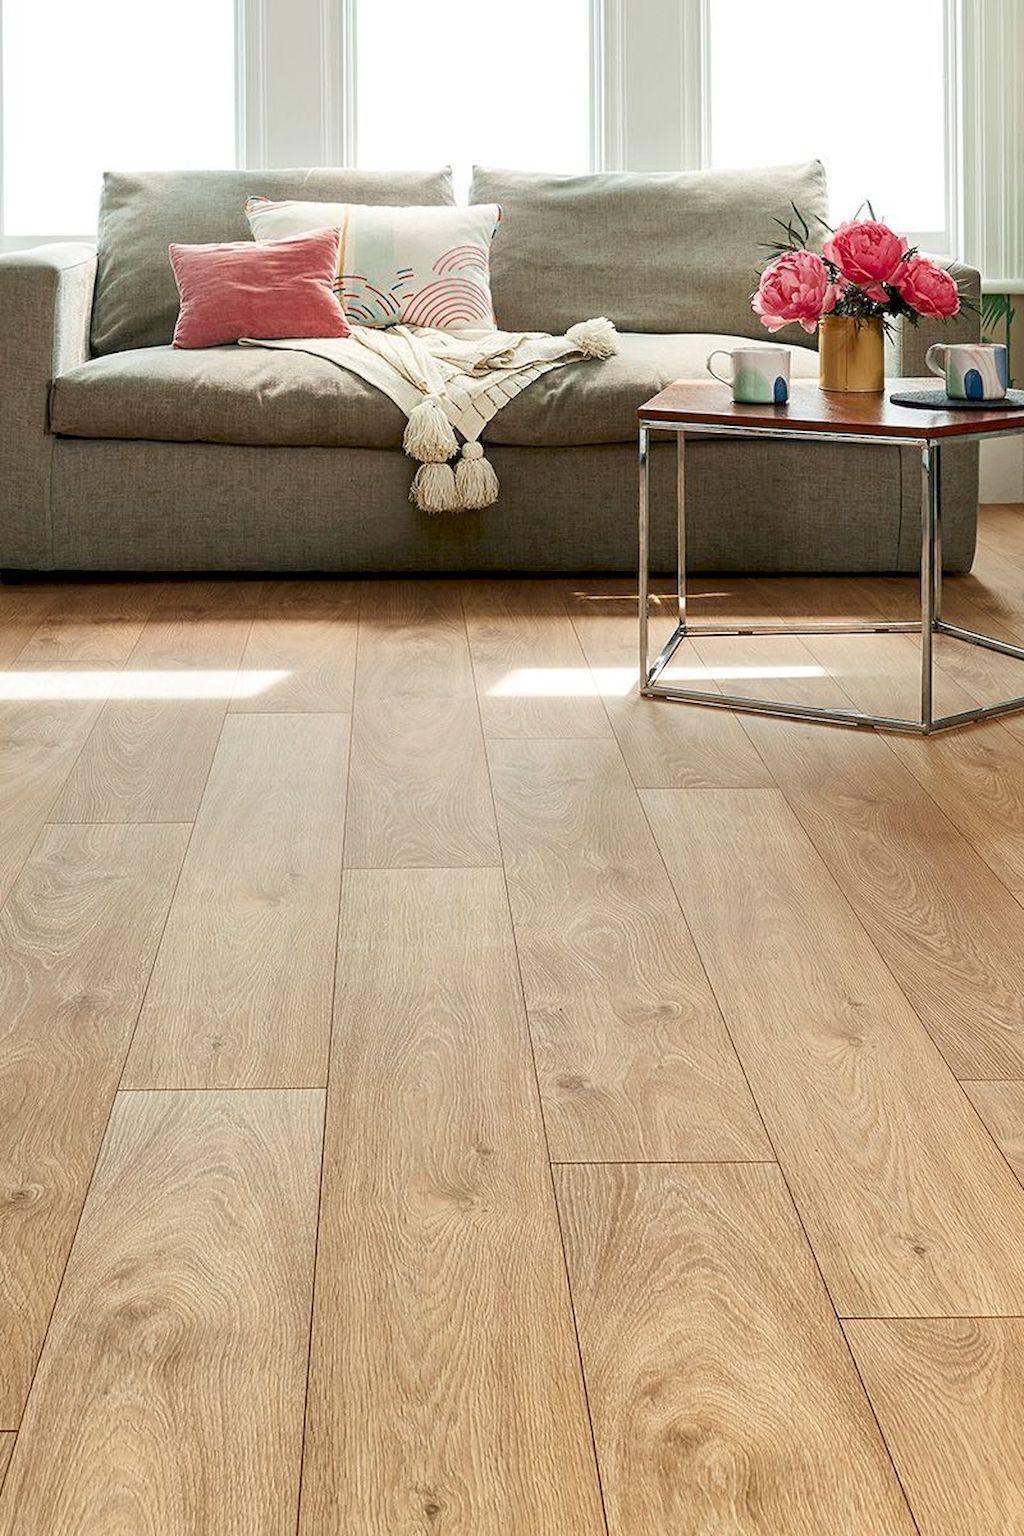 Brilliant Benefits Of Laying Wood Flooring Living Room Wood Floor Living Room Flooring Tile Floor Living Room Living room wooden floor